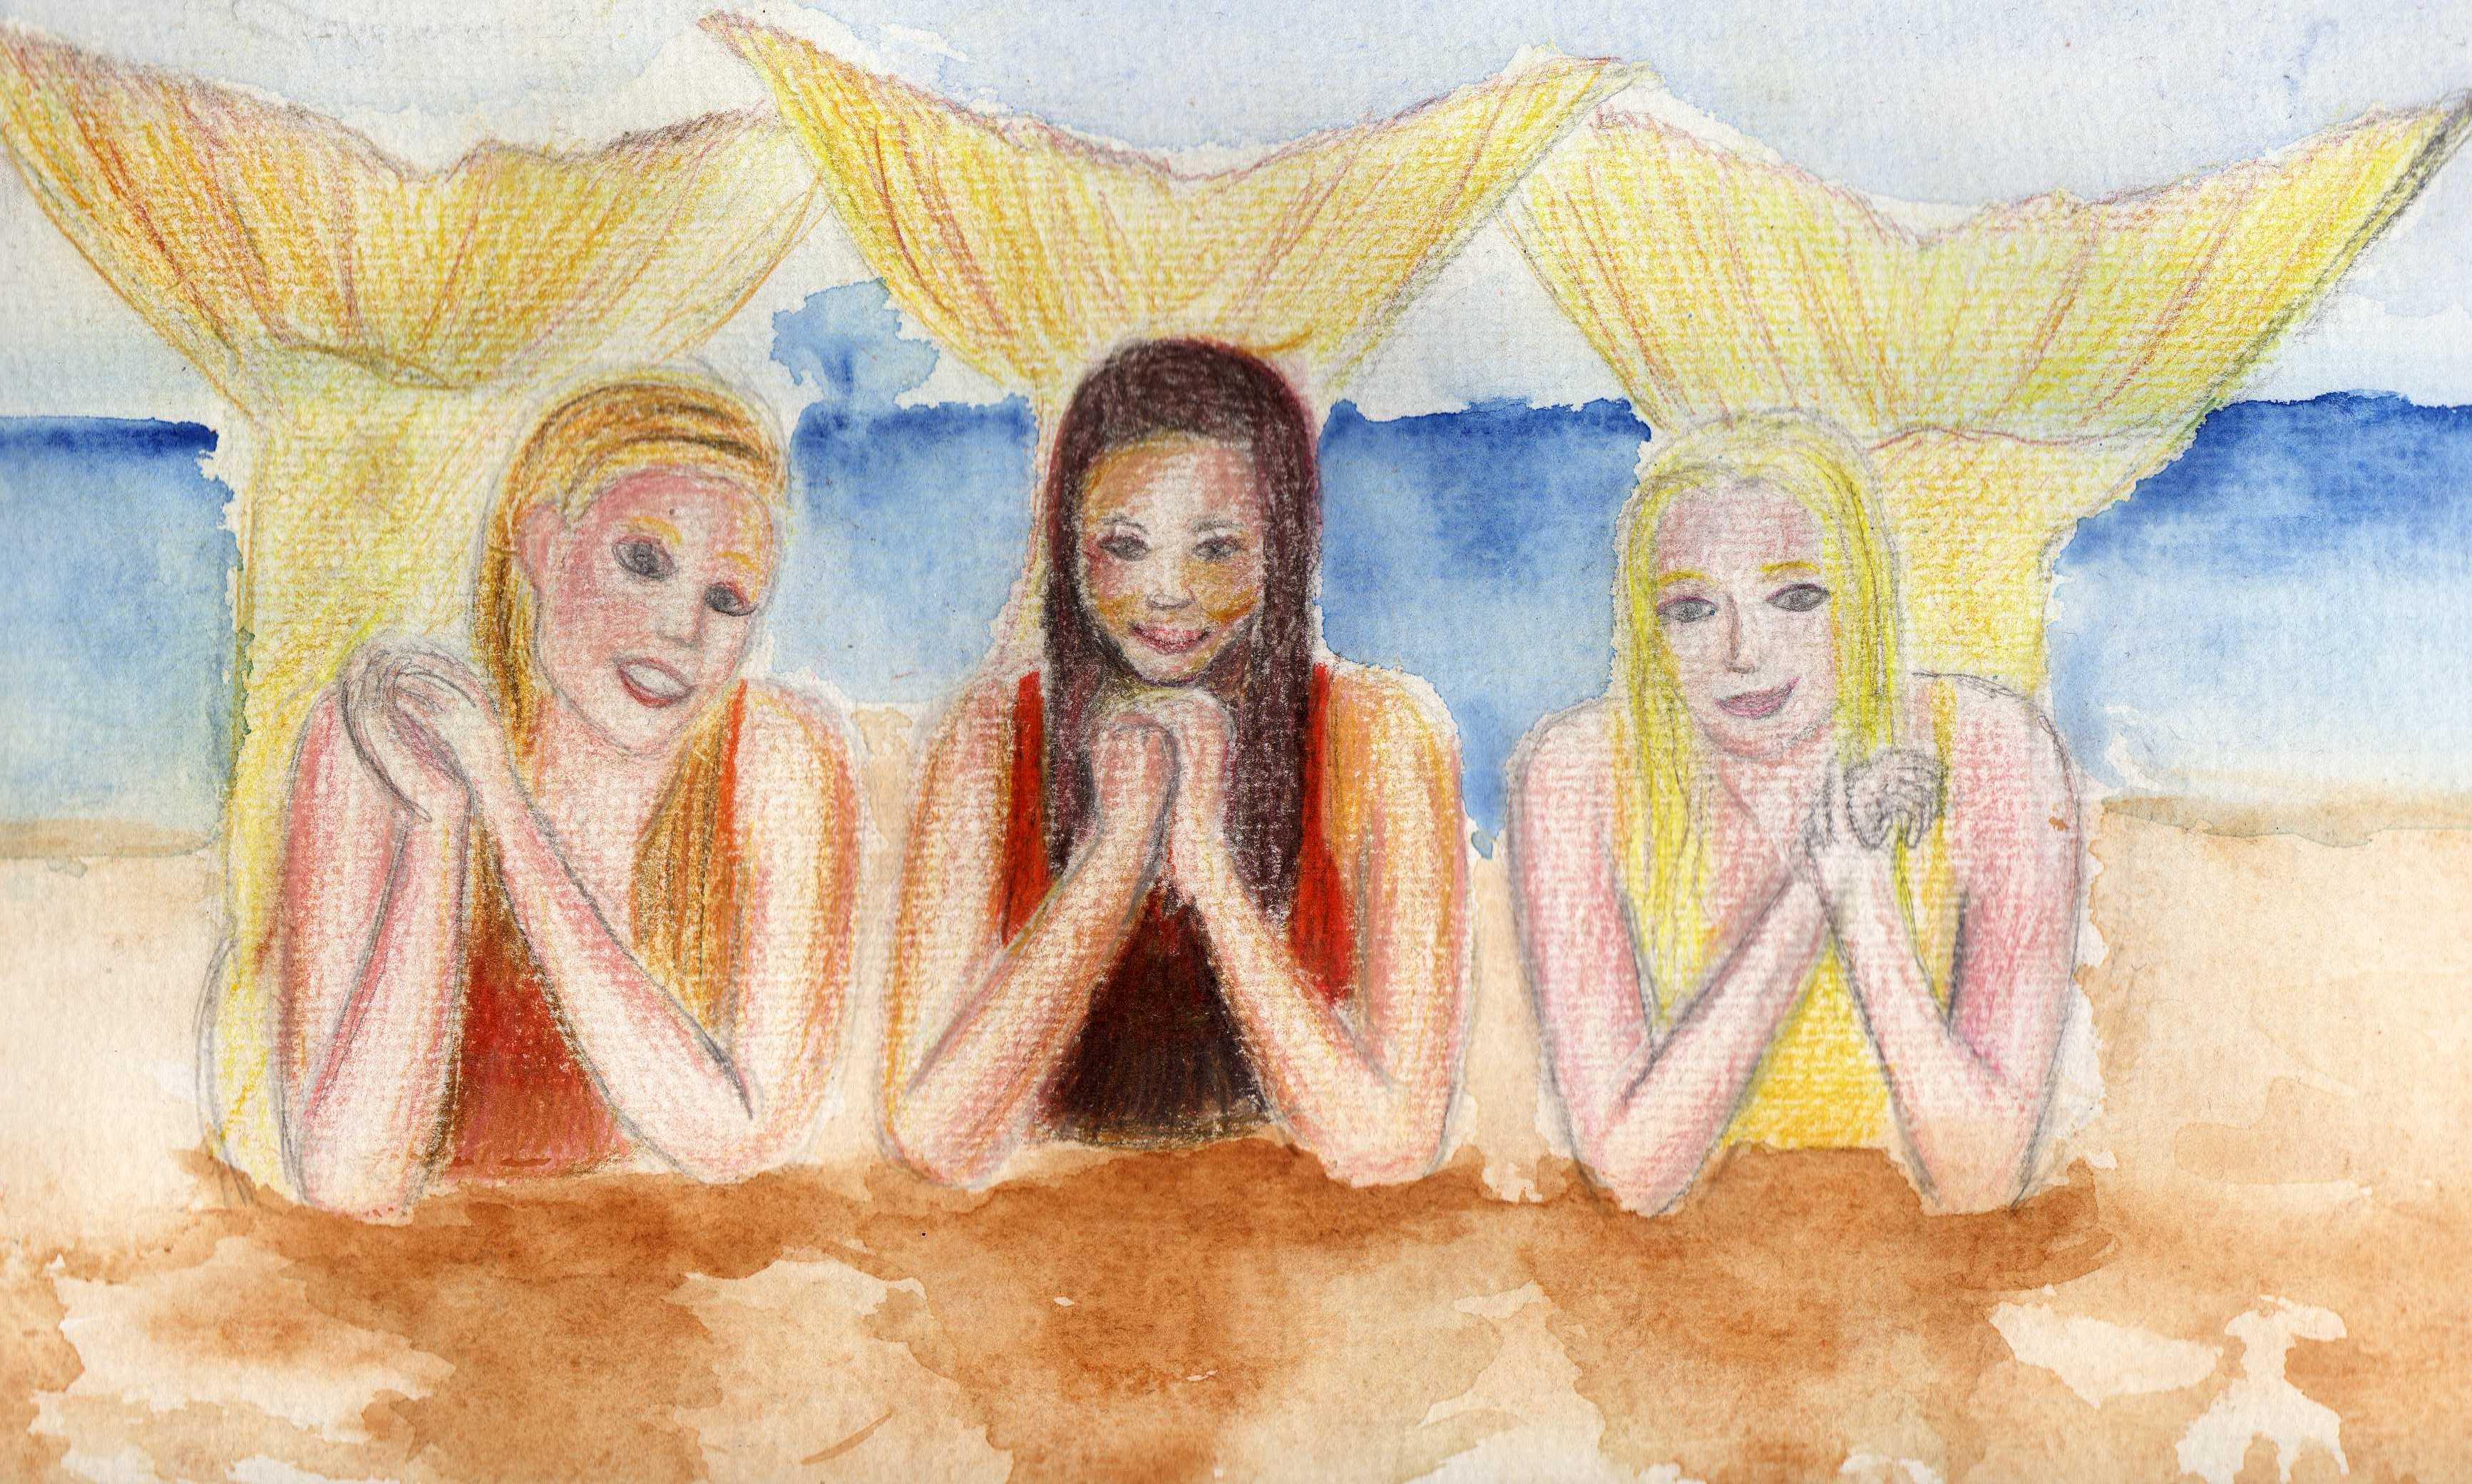 H2o Mermaids By Sunnyanna On Deviantart